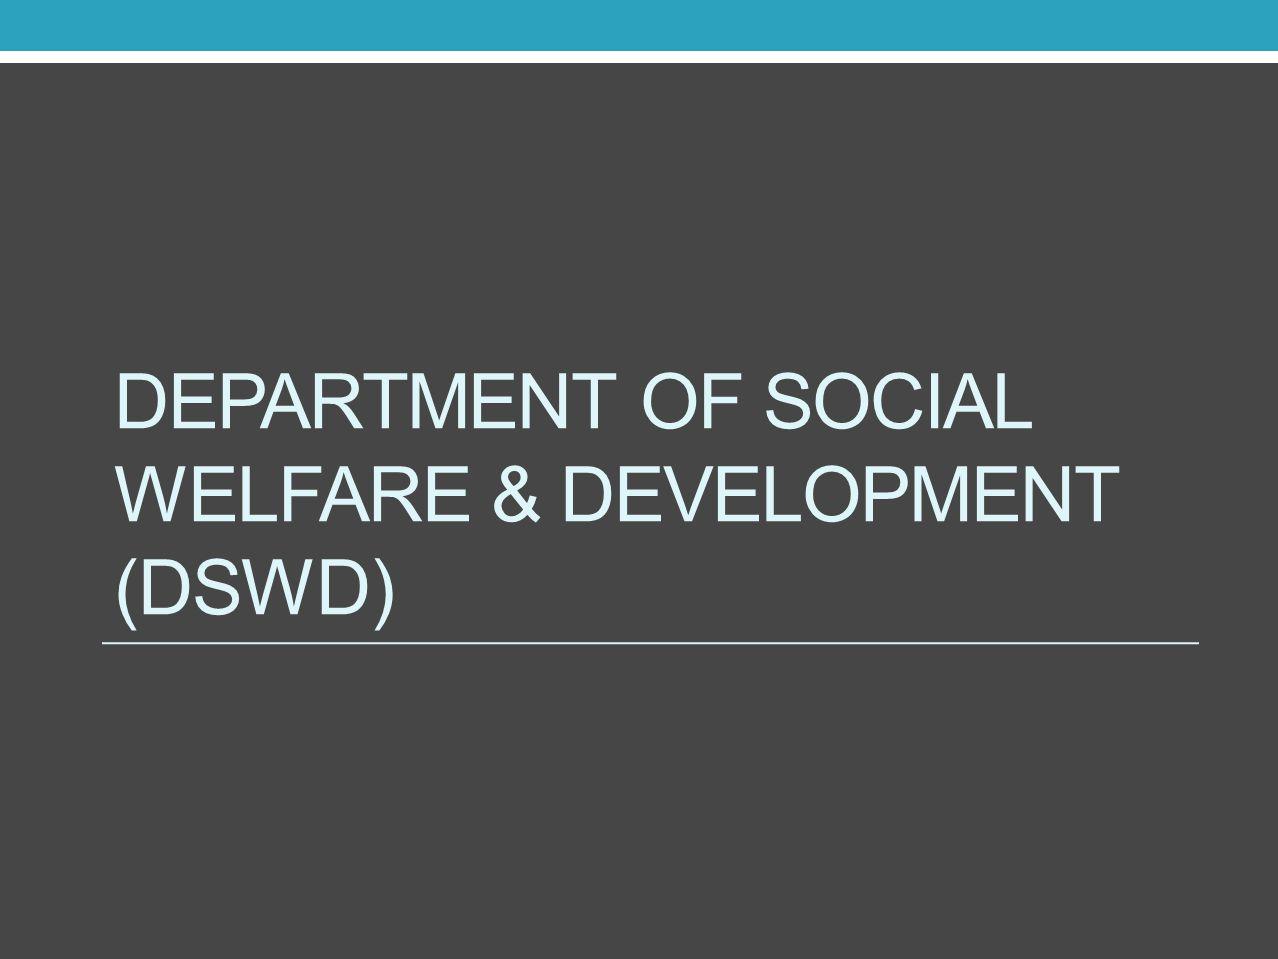 DEPARTMENT OF SOCIAL WELFARE & DEVELOPMENT (DSWD)